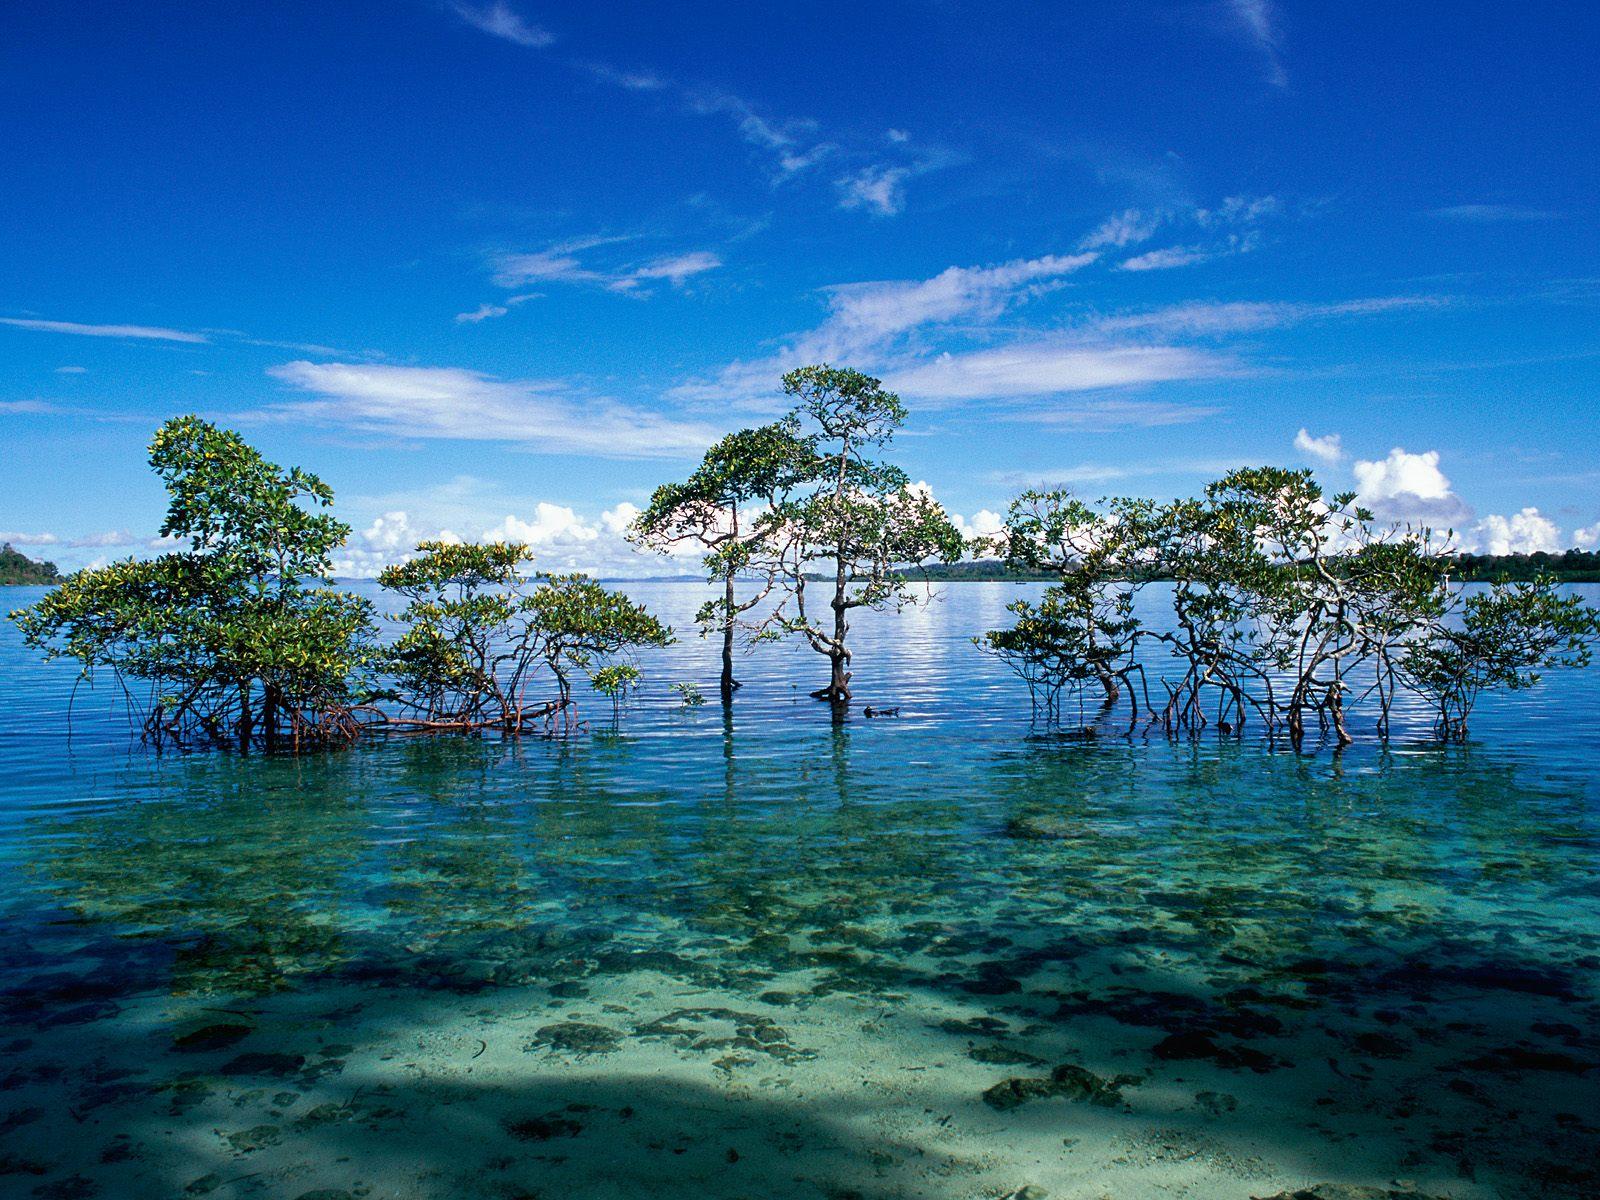 Havelock_Island__Andaman_and_Nicobar_Islands__India